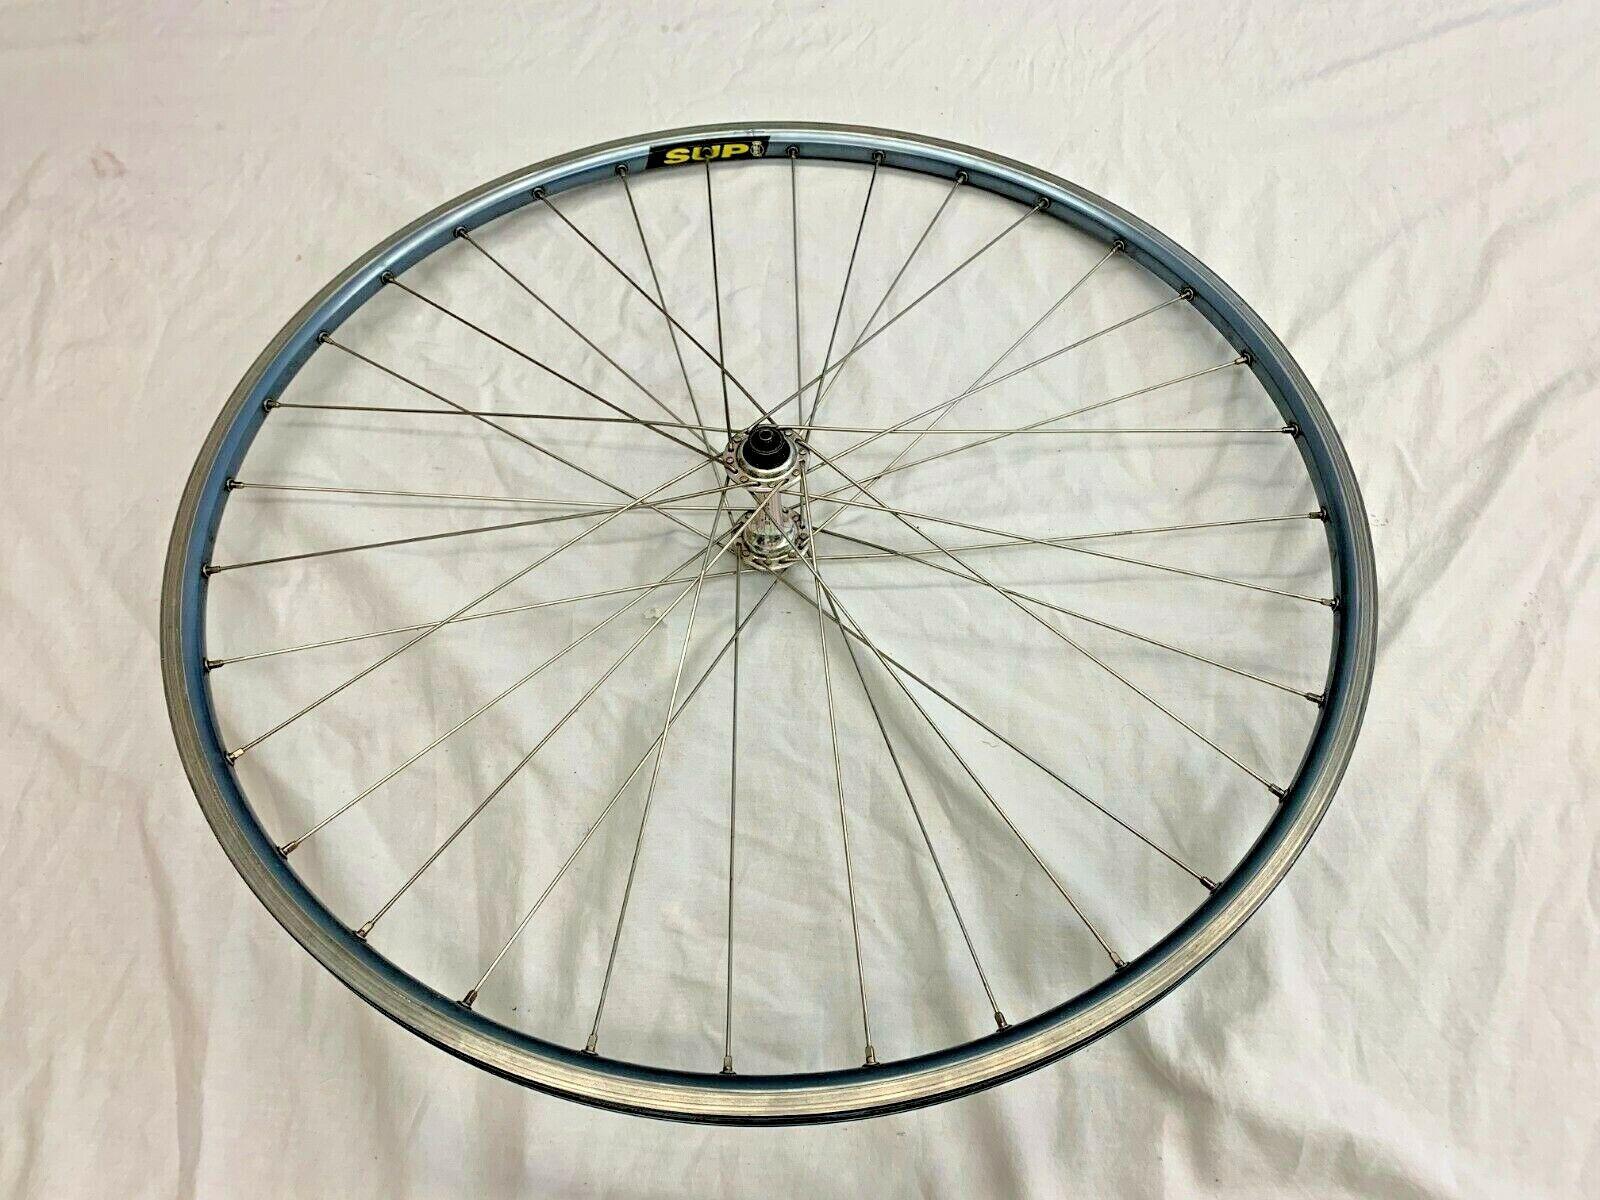 "Tricycle Trike 24/"" w 144 spokes Rear Wheel Bike w//Hollow Rim"